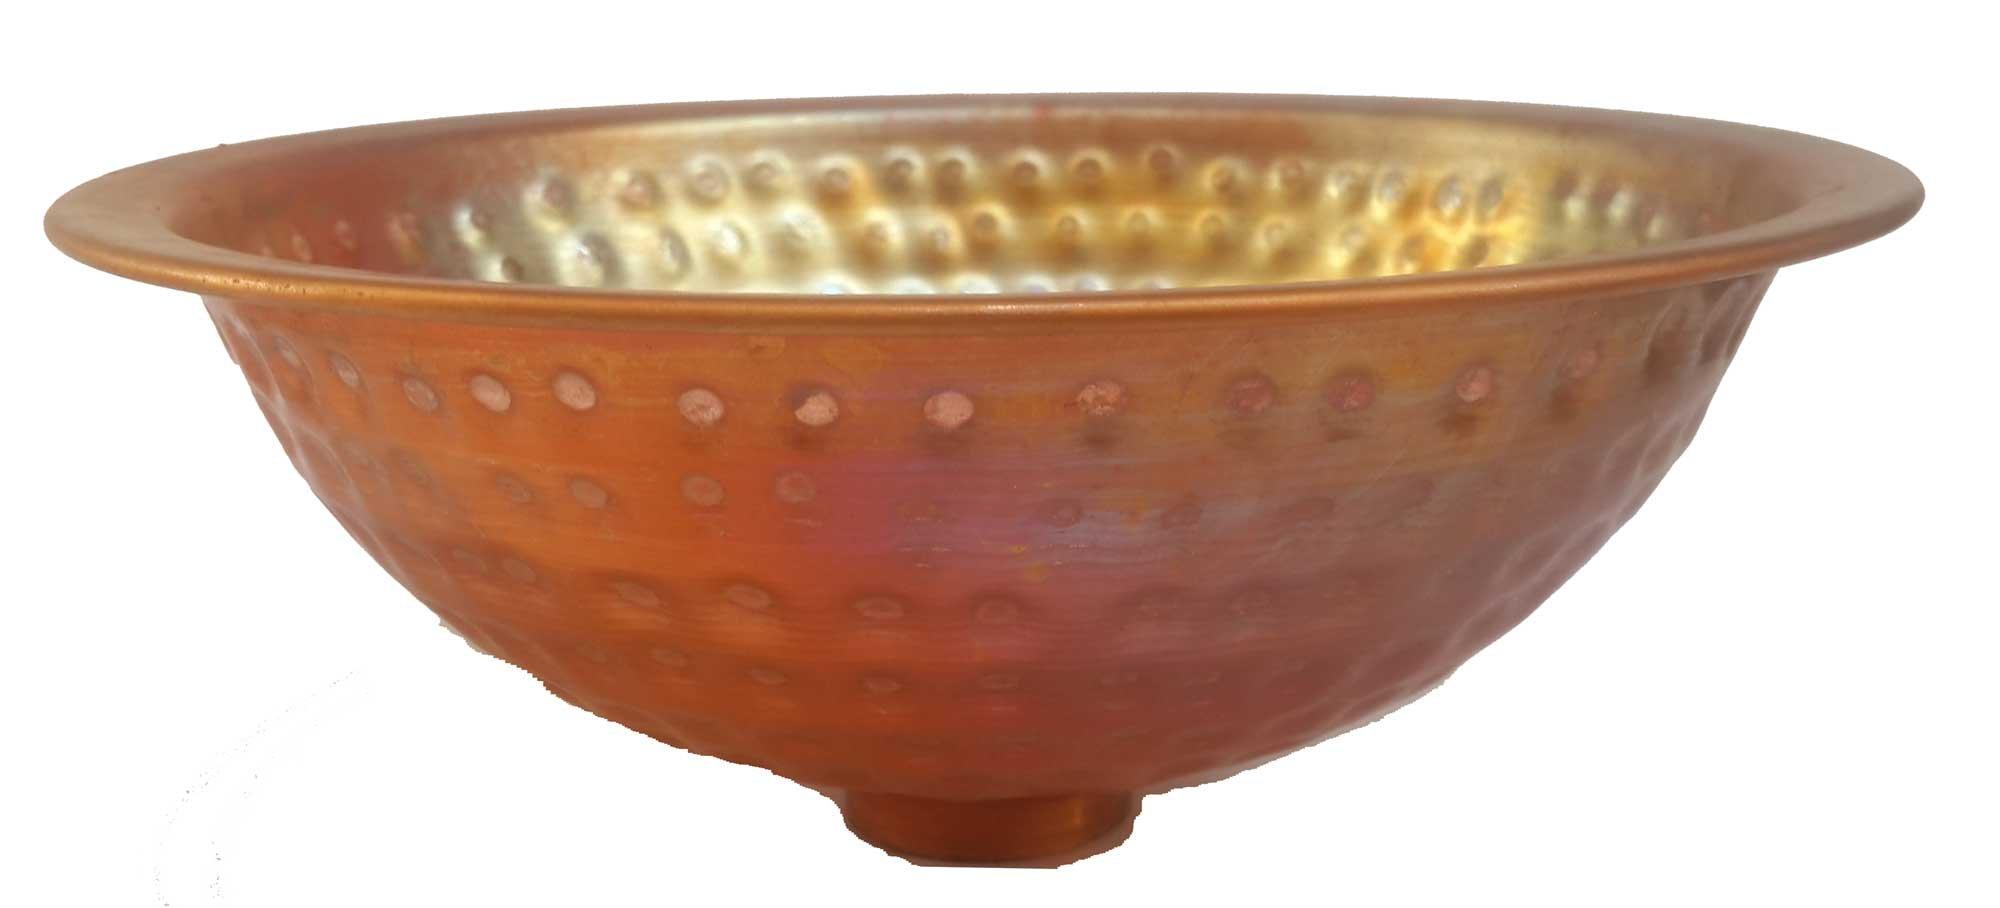 Egypt gift shops Tiny Small Compact Copper Single Bowl Basin Women Powder Room Toilet Bathroom Sink